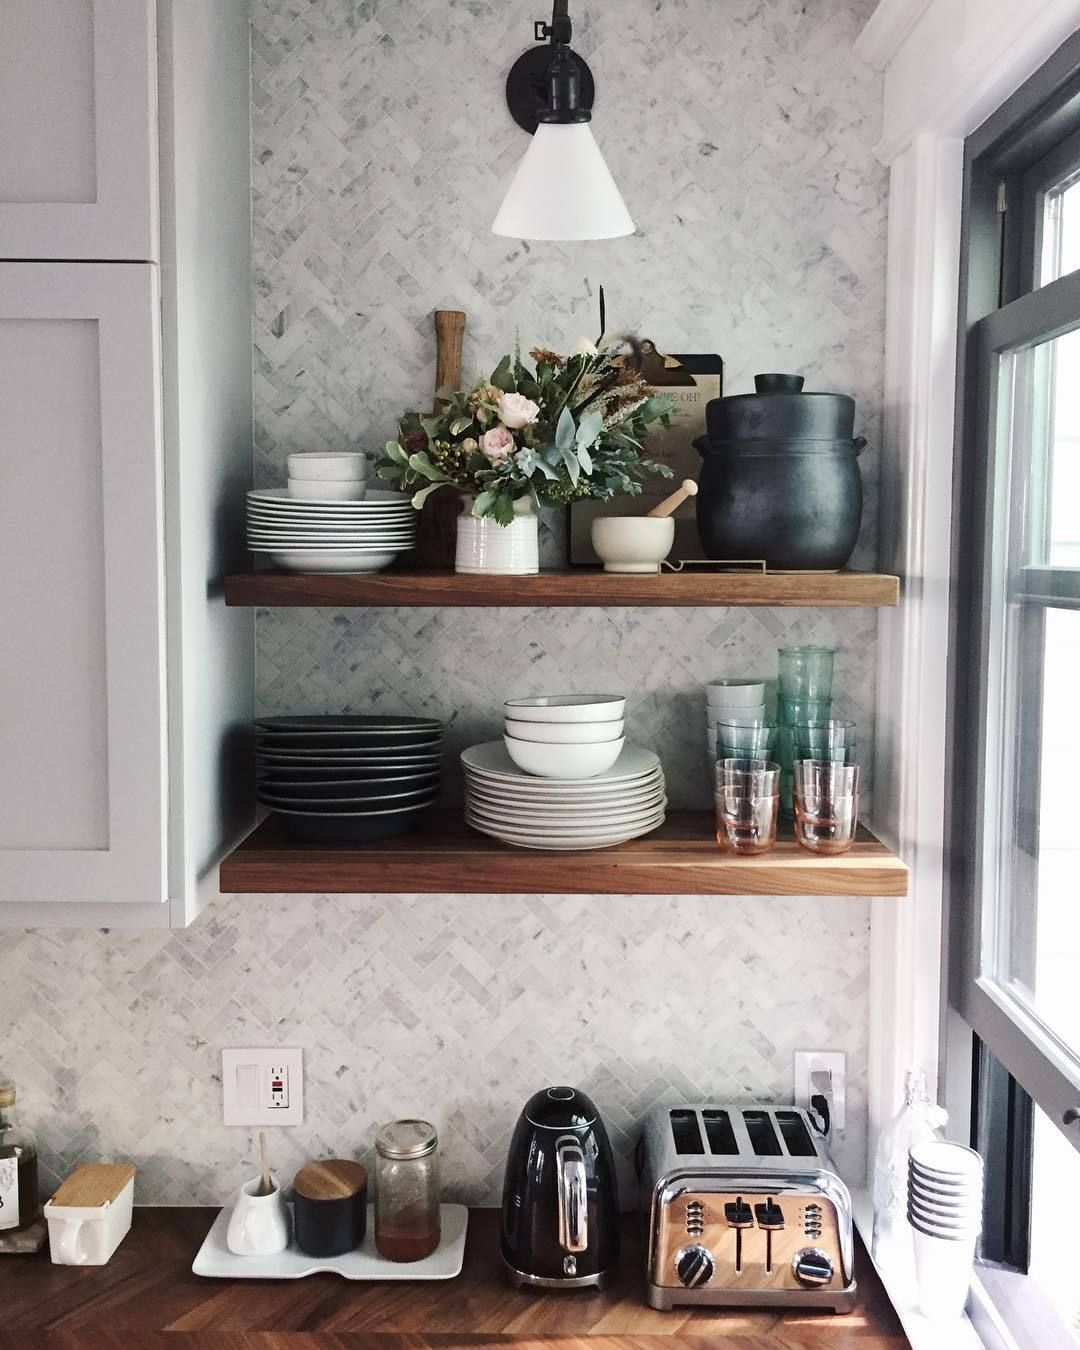 bryn smith floating shelves floating shelves kitchen on floating shelves kitchen id=68321